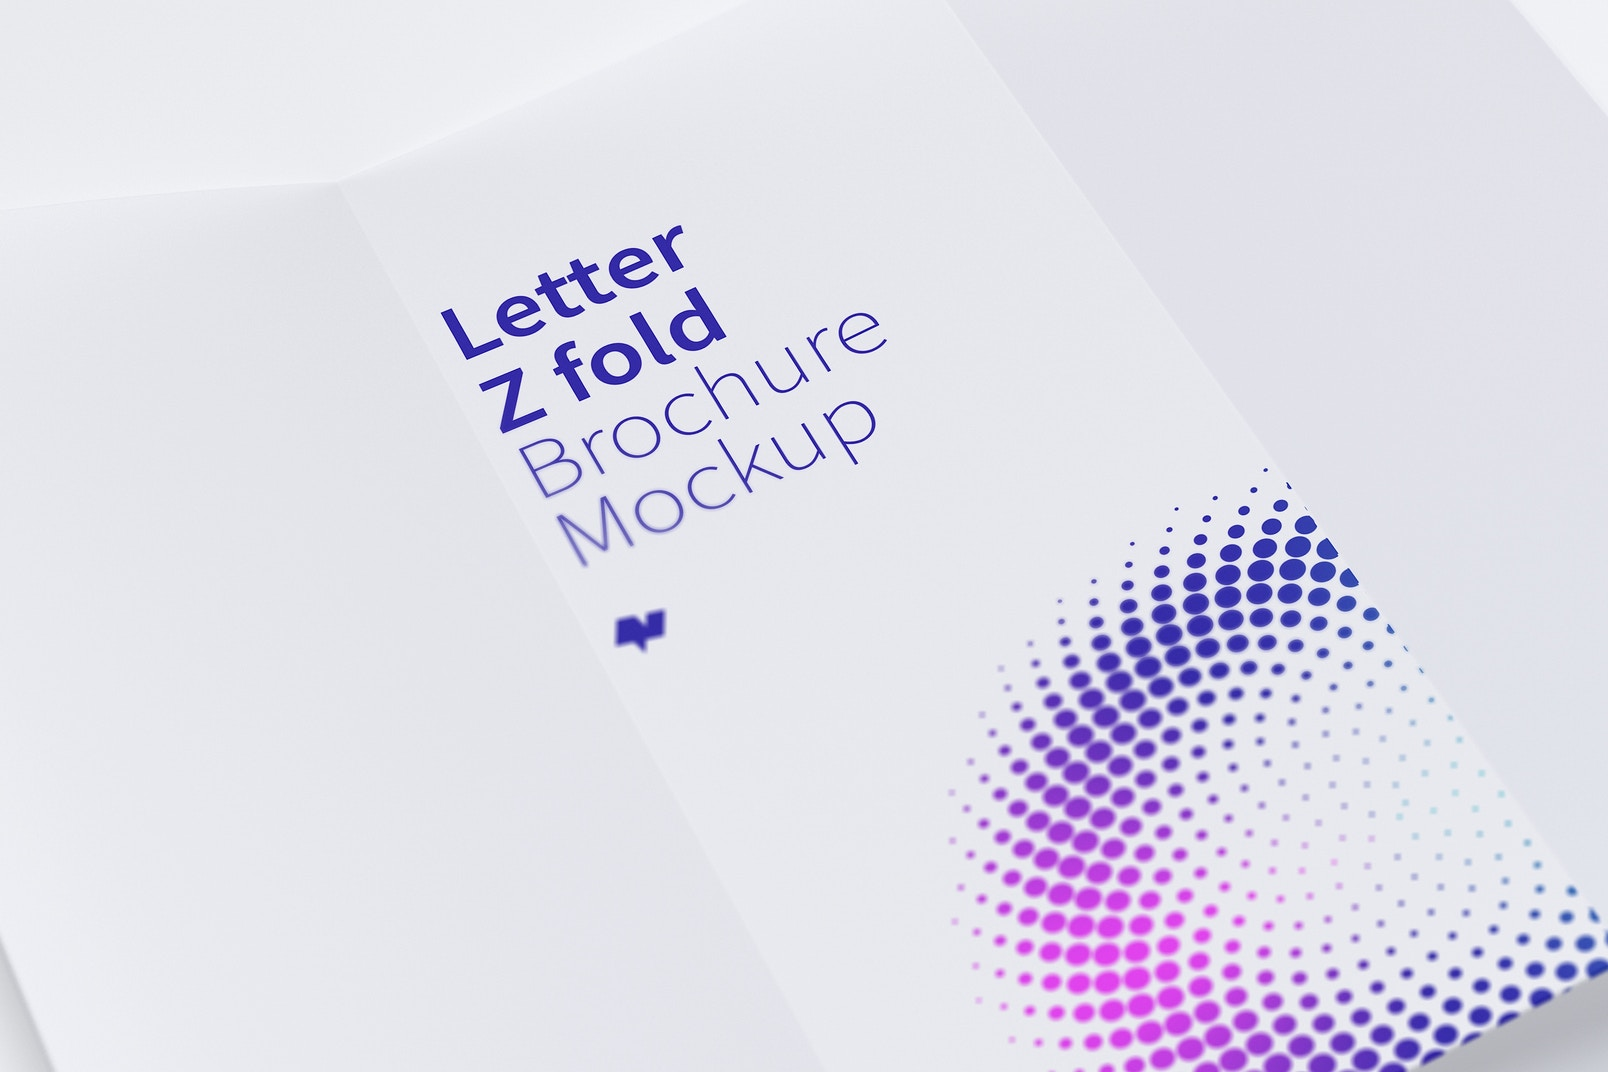 Letter Z Fold Brochure Mockup 03